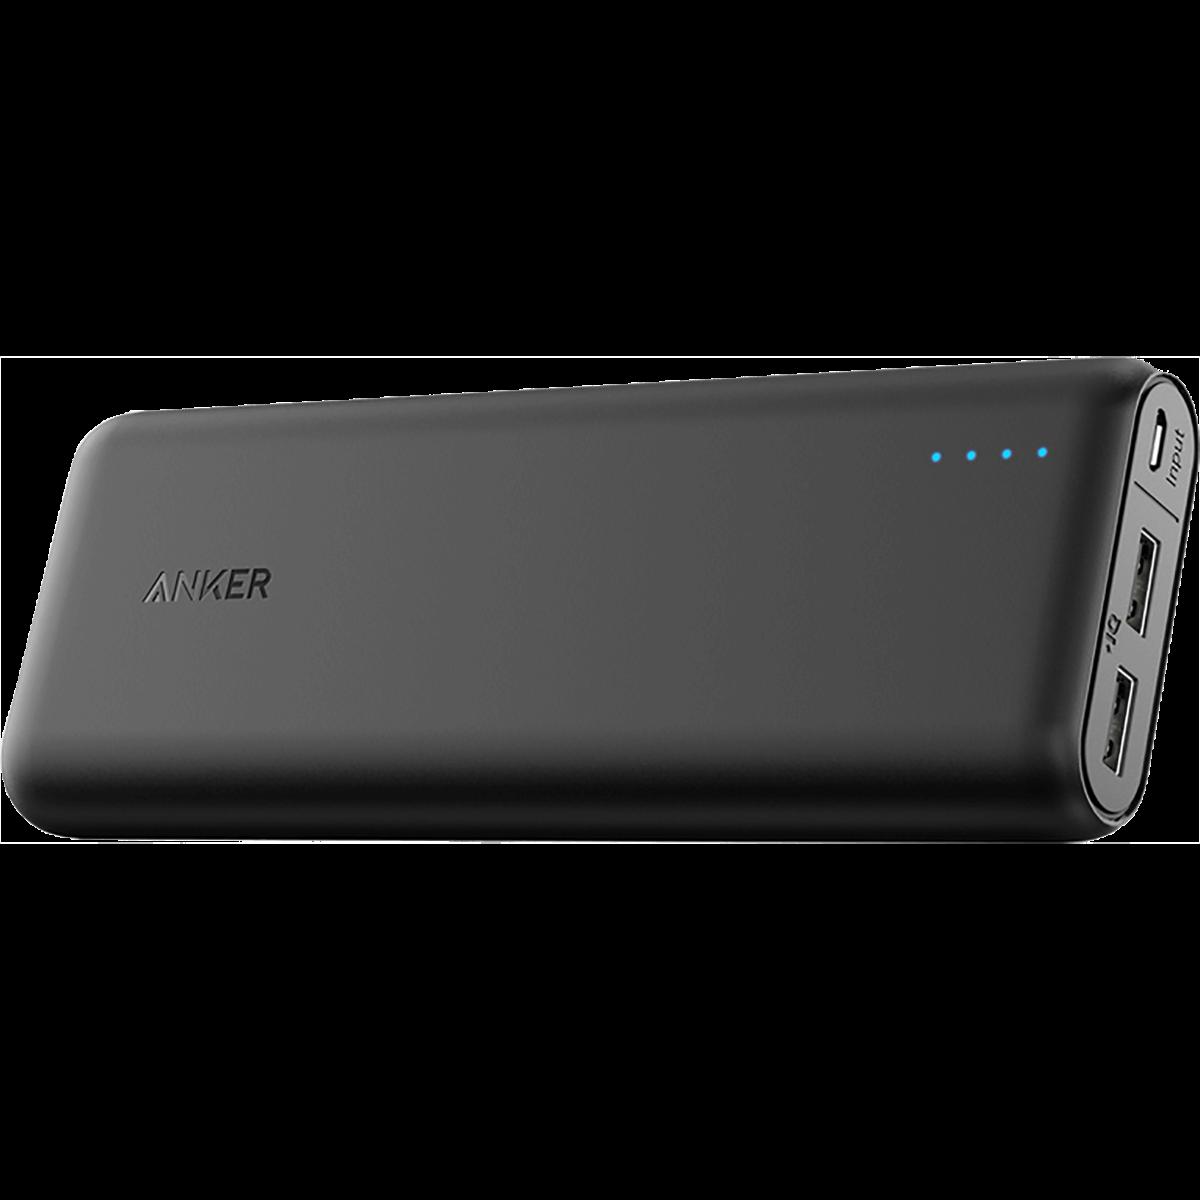 Akku für TPCAST Wireless Adapter